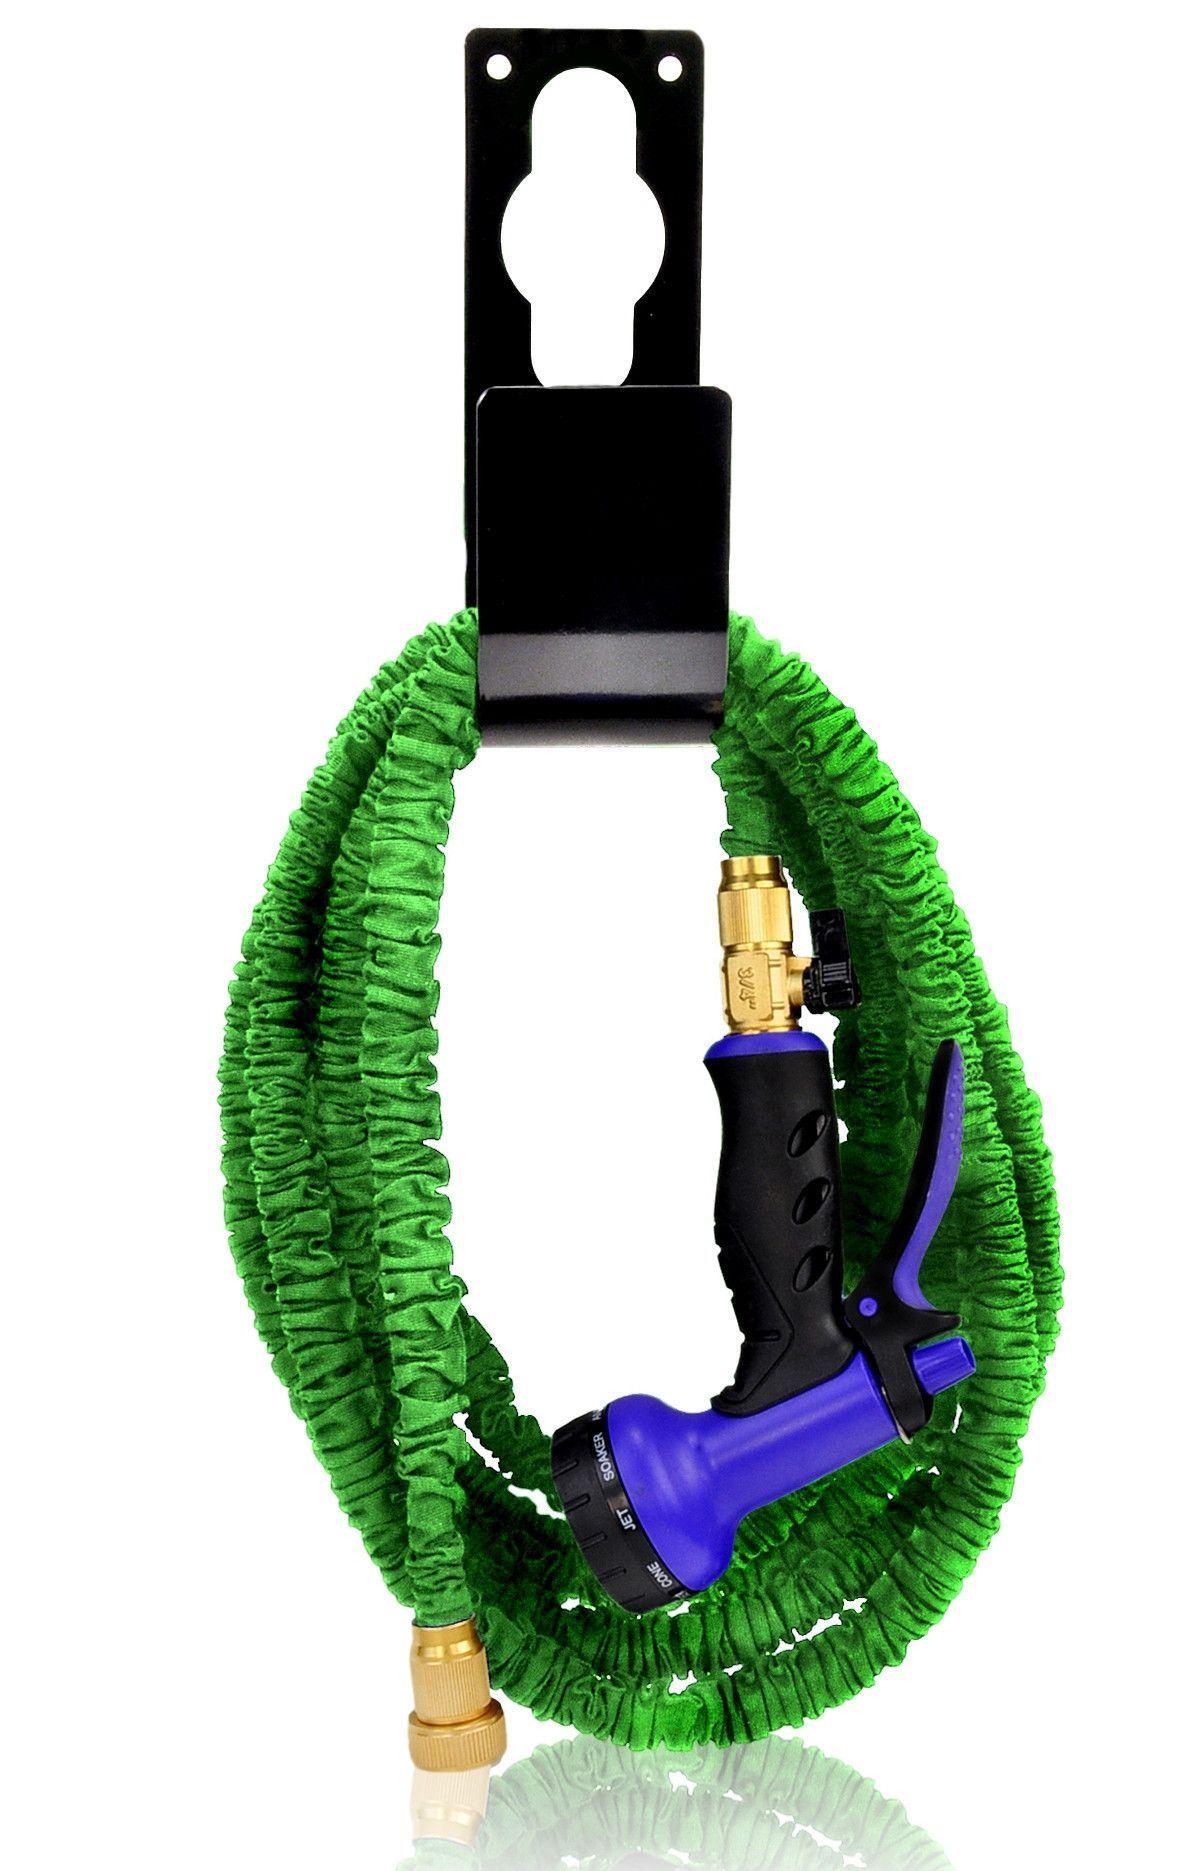 Metal Hose Holder Black Metal hose, Hose holder, Water